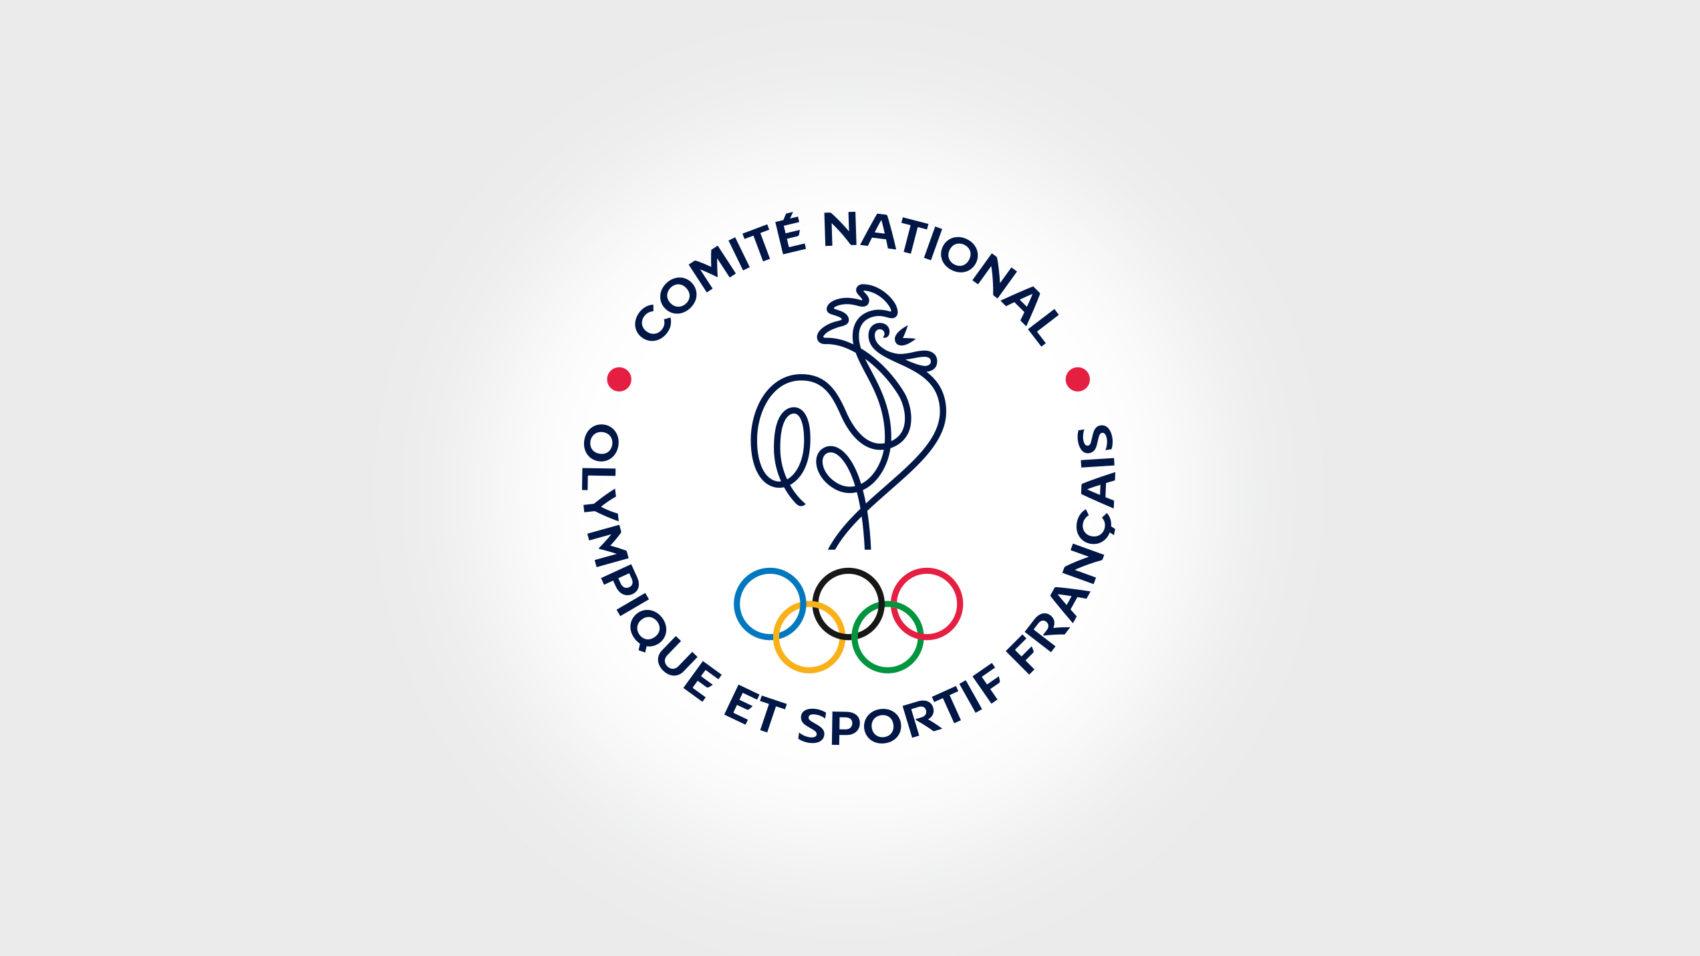 Projet_project_realisation_CNOSF_comite_national_olympique_et_sportif_francais_2